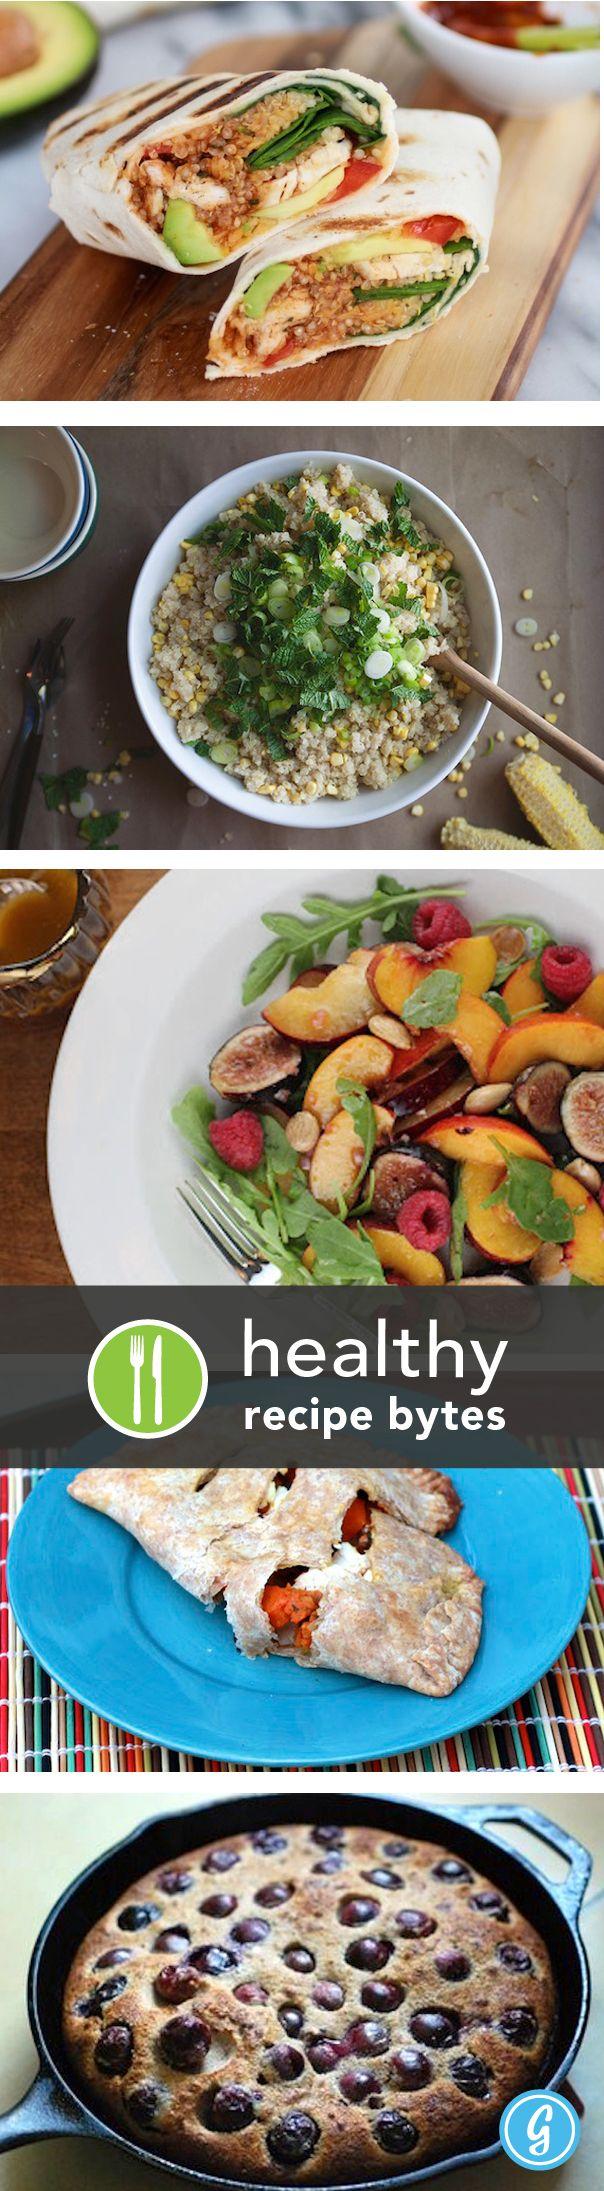 Healthier Picnic Recipes!